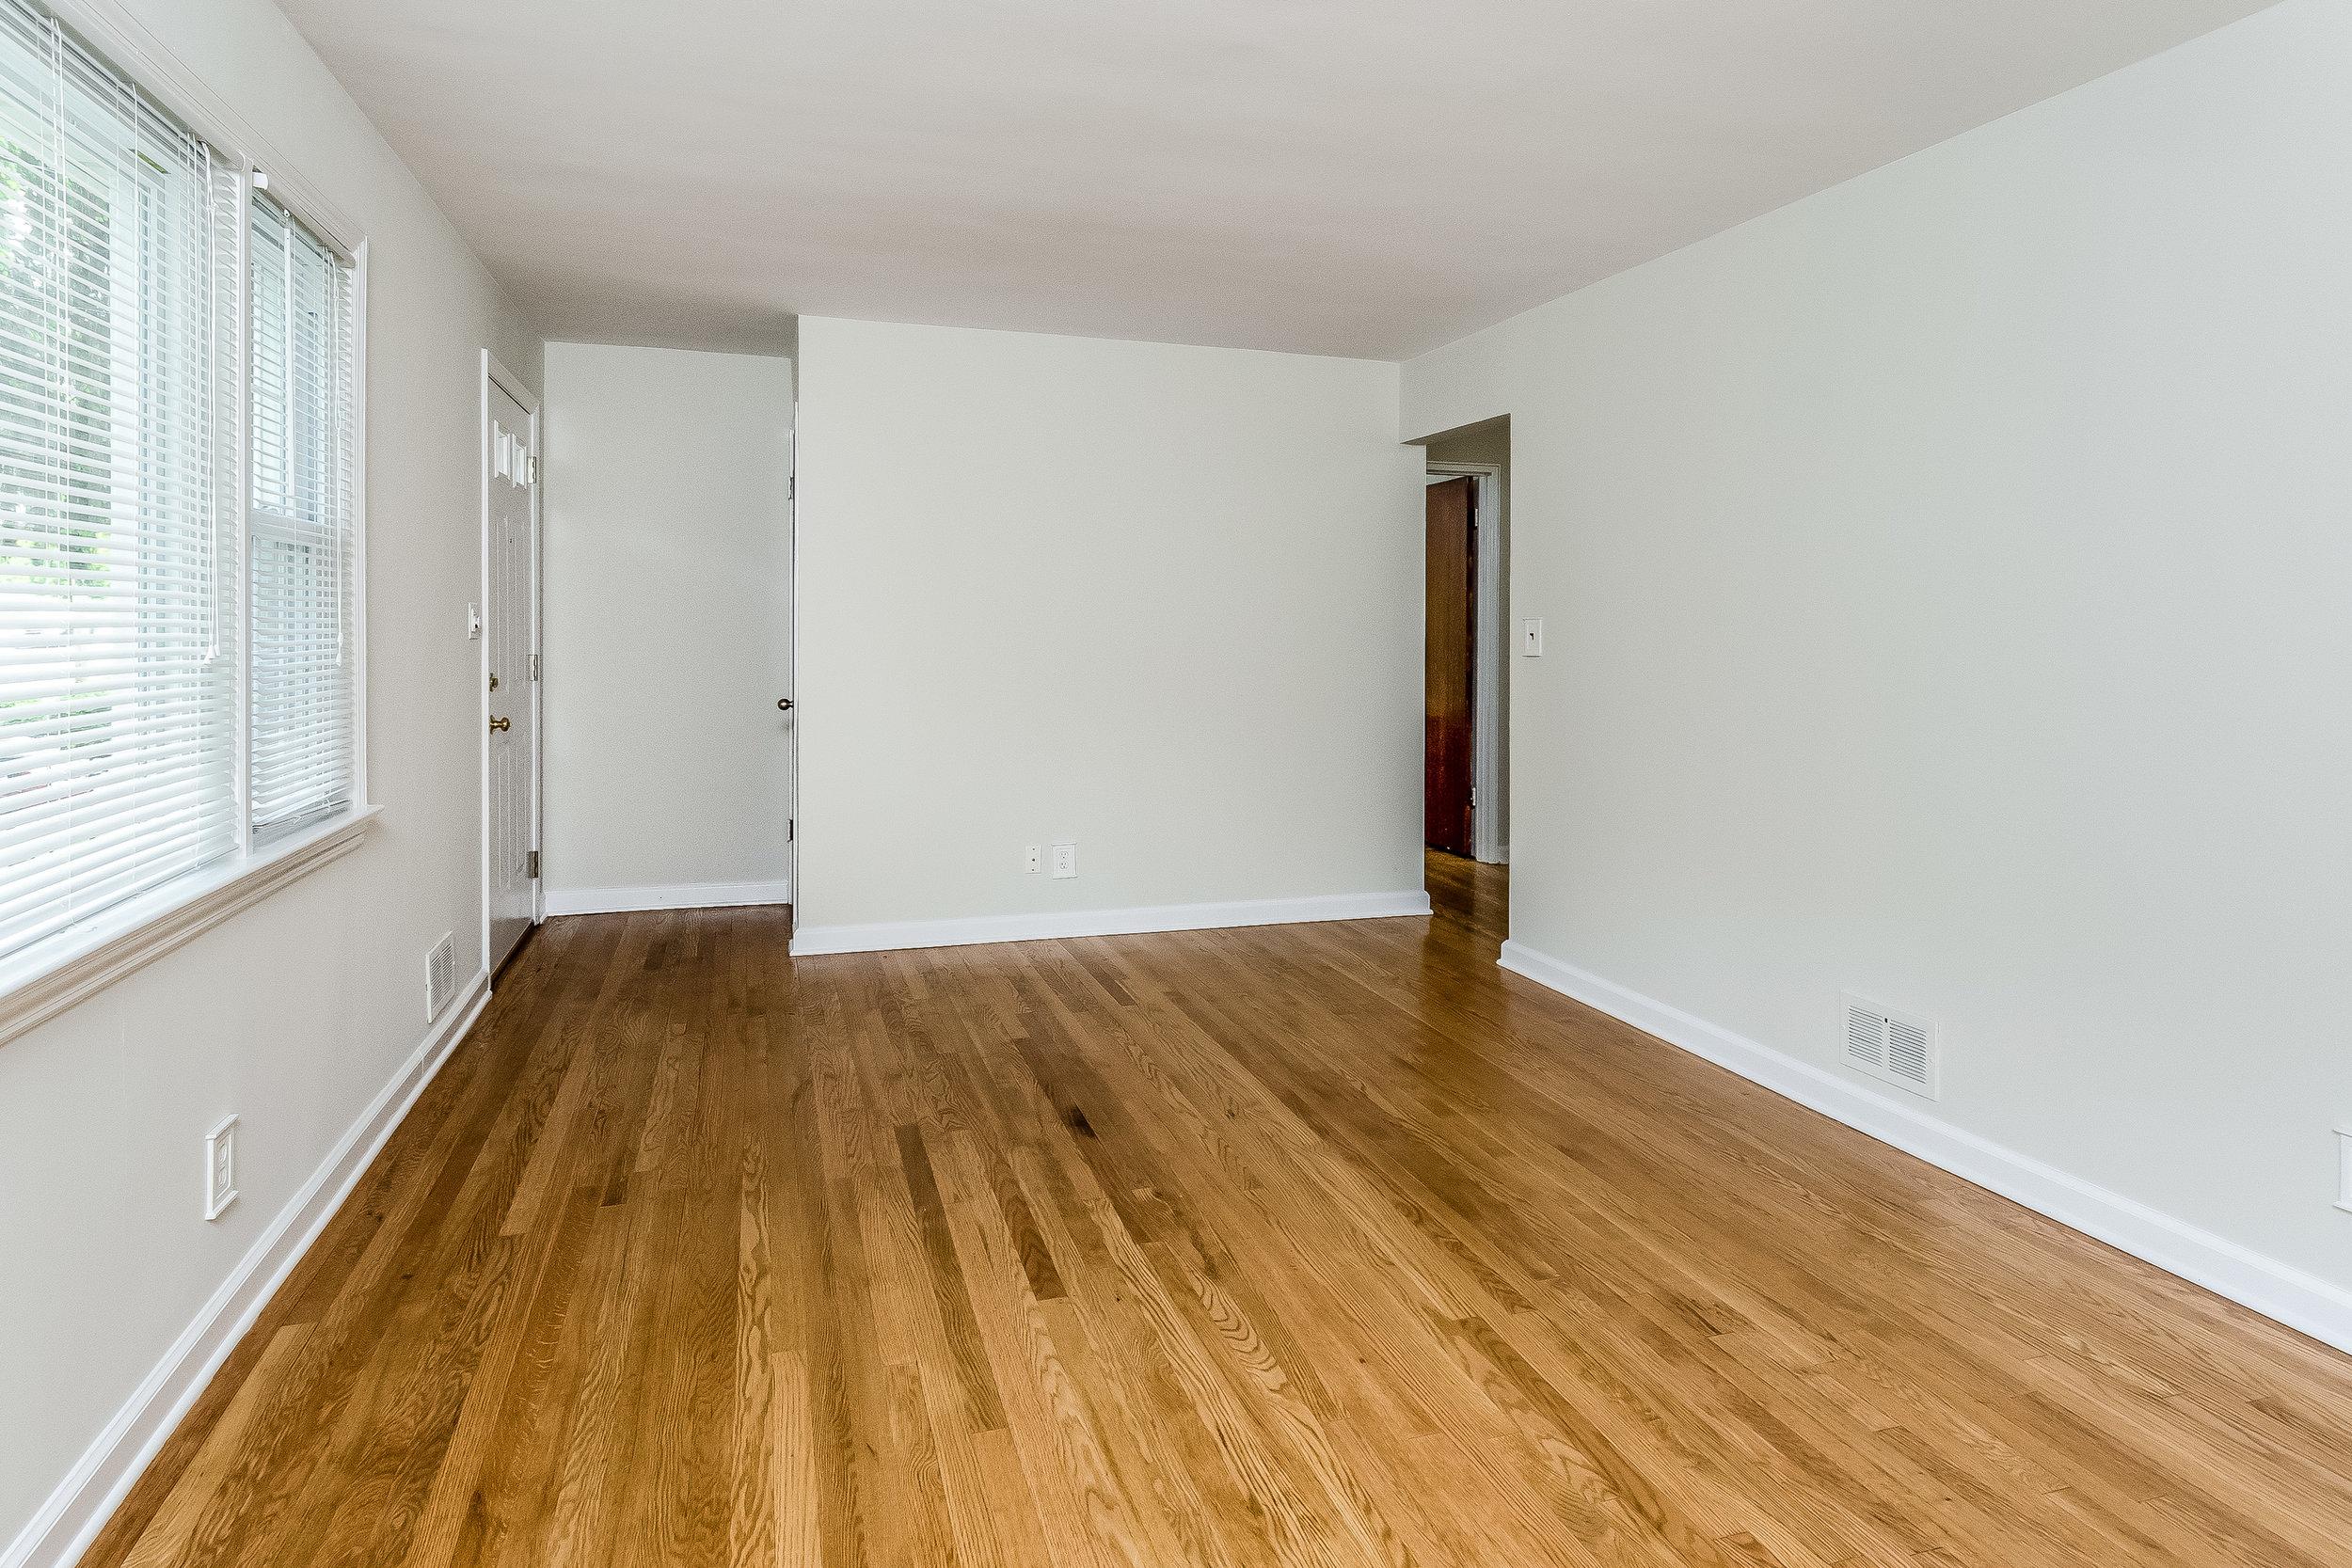 009-photo-living-room-5786546.jpg